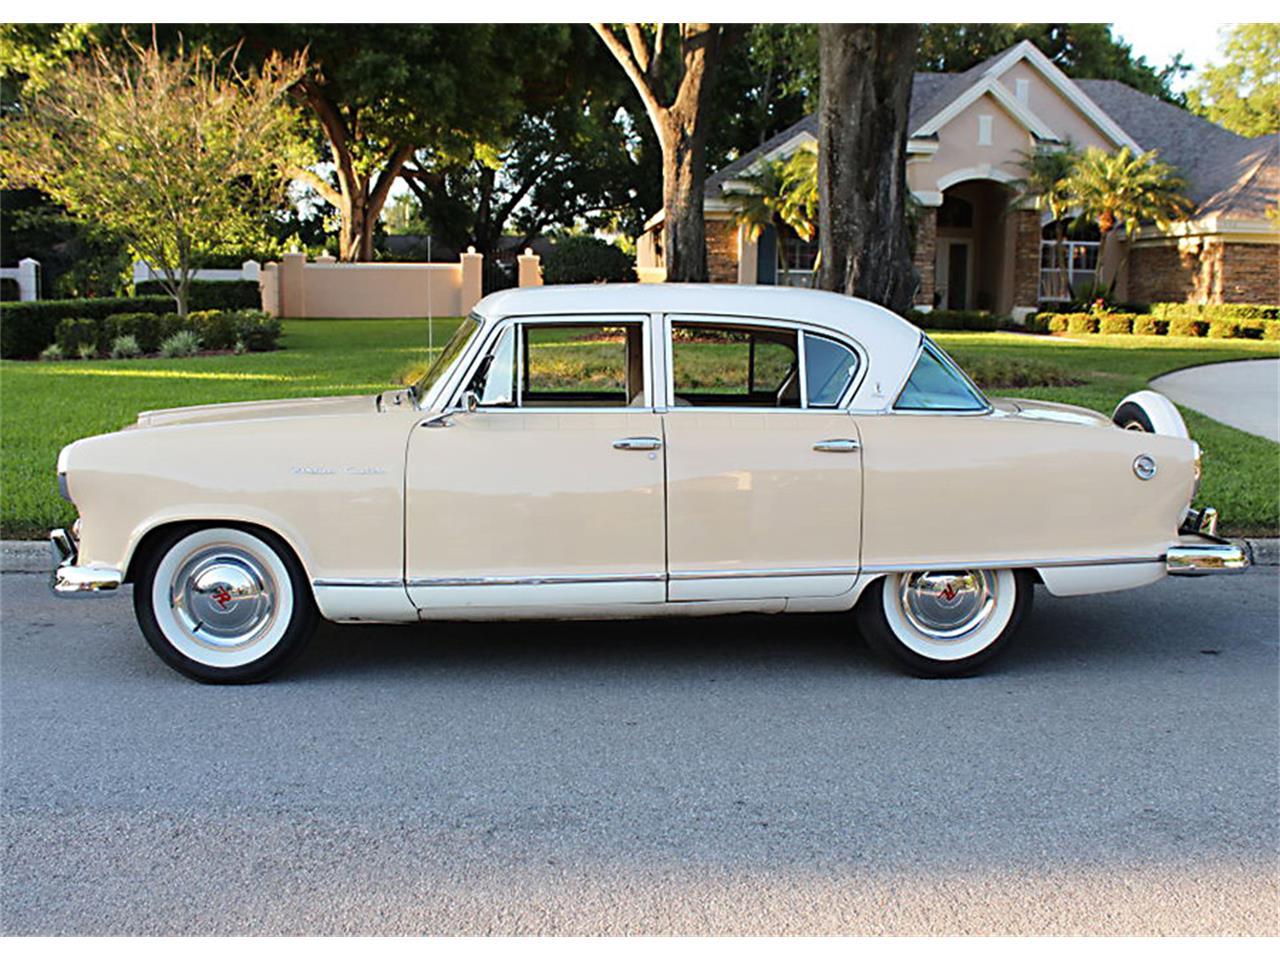 Large Picture of '55 Nash Rambler located in Lakeland Florida - $14,500.00 - PUZO